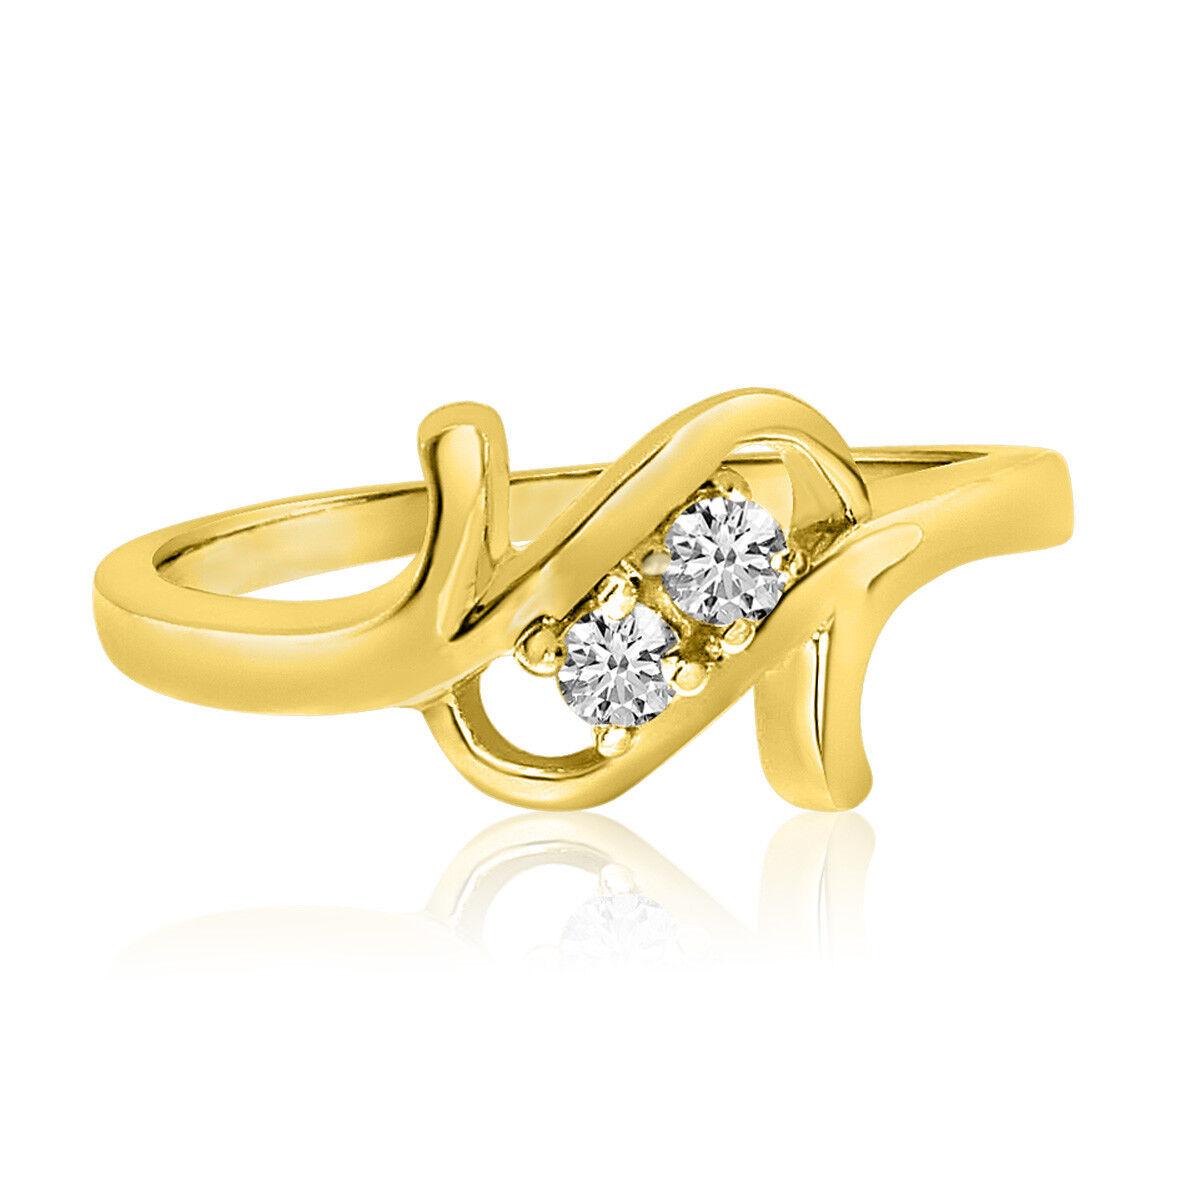 14K Yellow gold Twist Two-Stone Diamond Ring